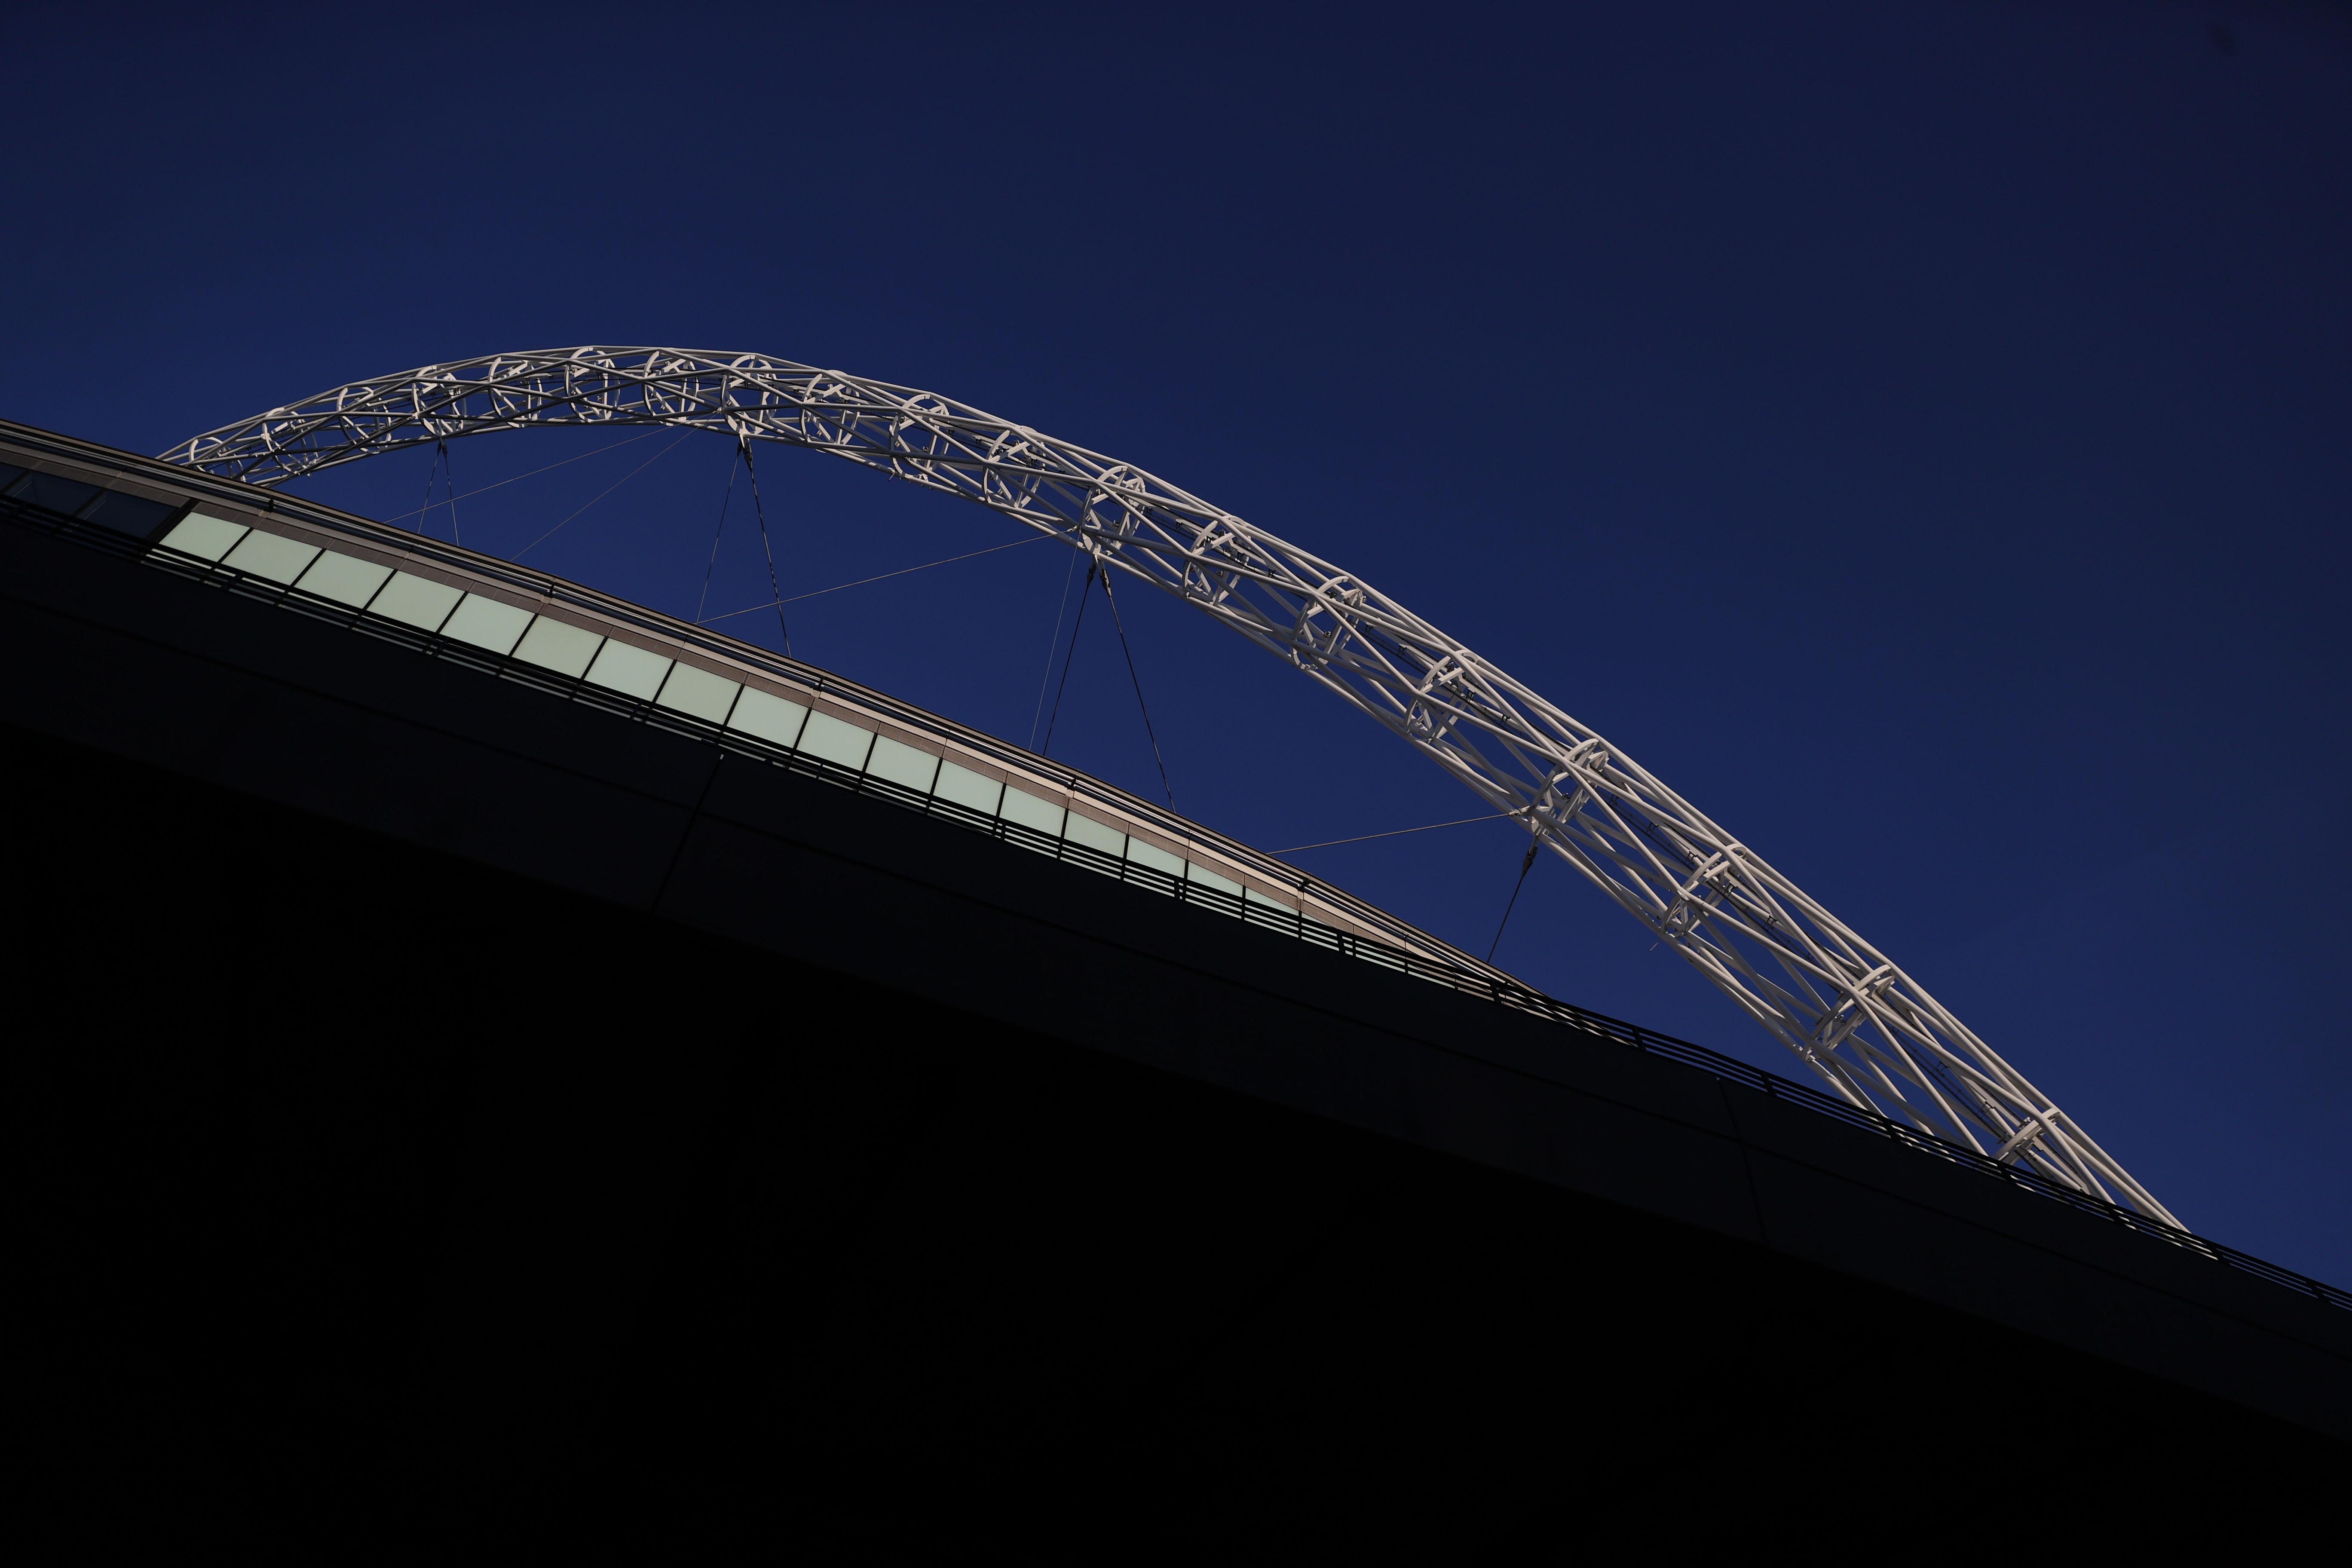 Soccer Football - Euro 2020 - Group D - General view of Wembley Stadium ahead of the England v Croatia match - Wembley Stadium, London, Britain - June 12, 2021 REUTERS/Carl Recine